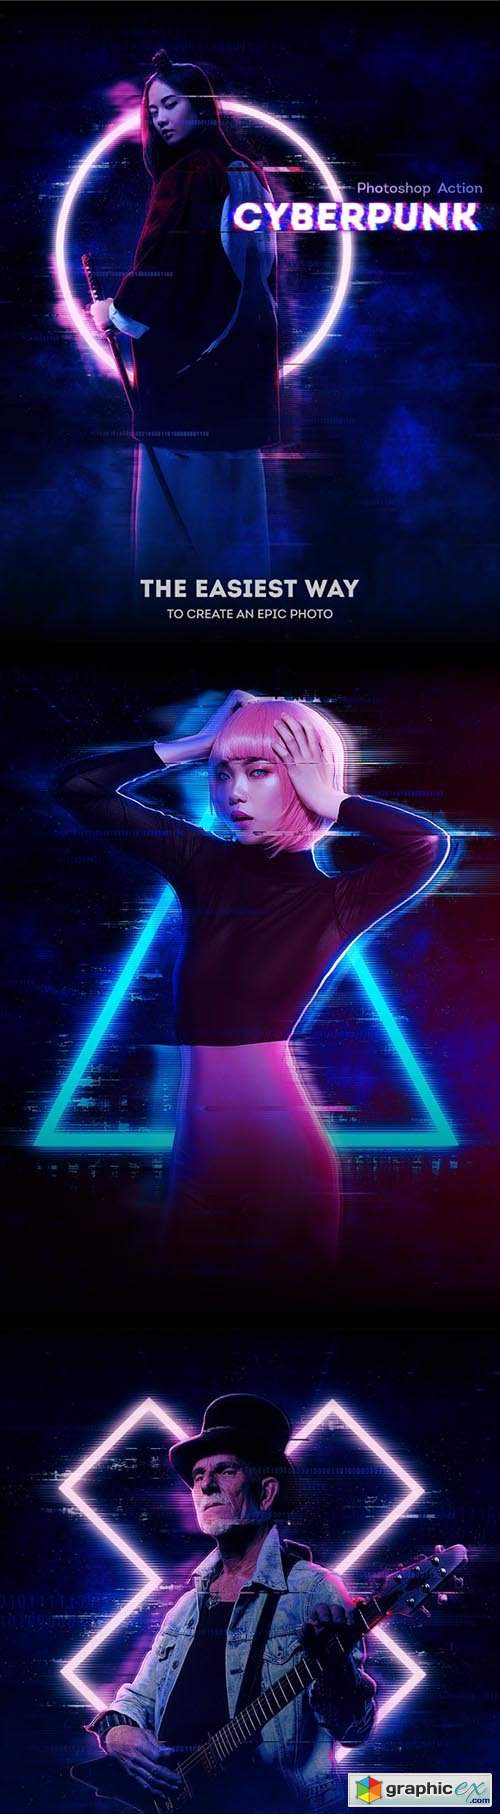 Cyberpunk Photoshop Action 31152285